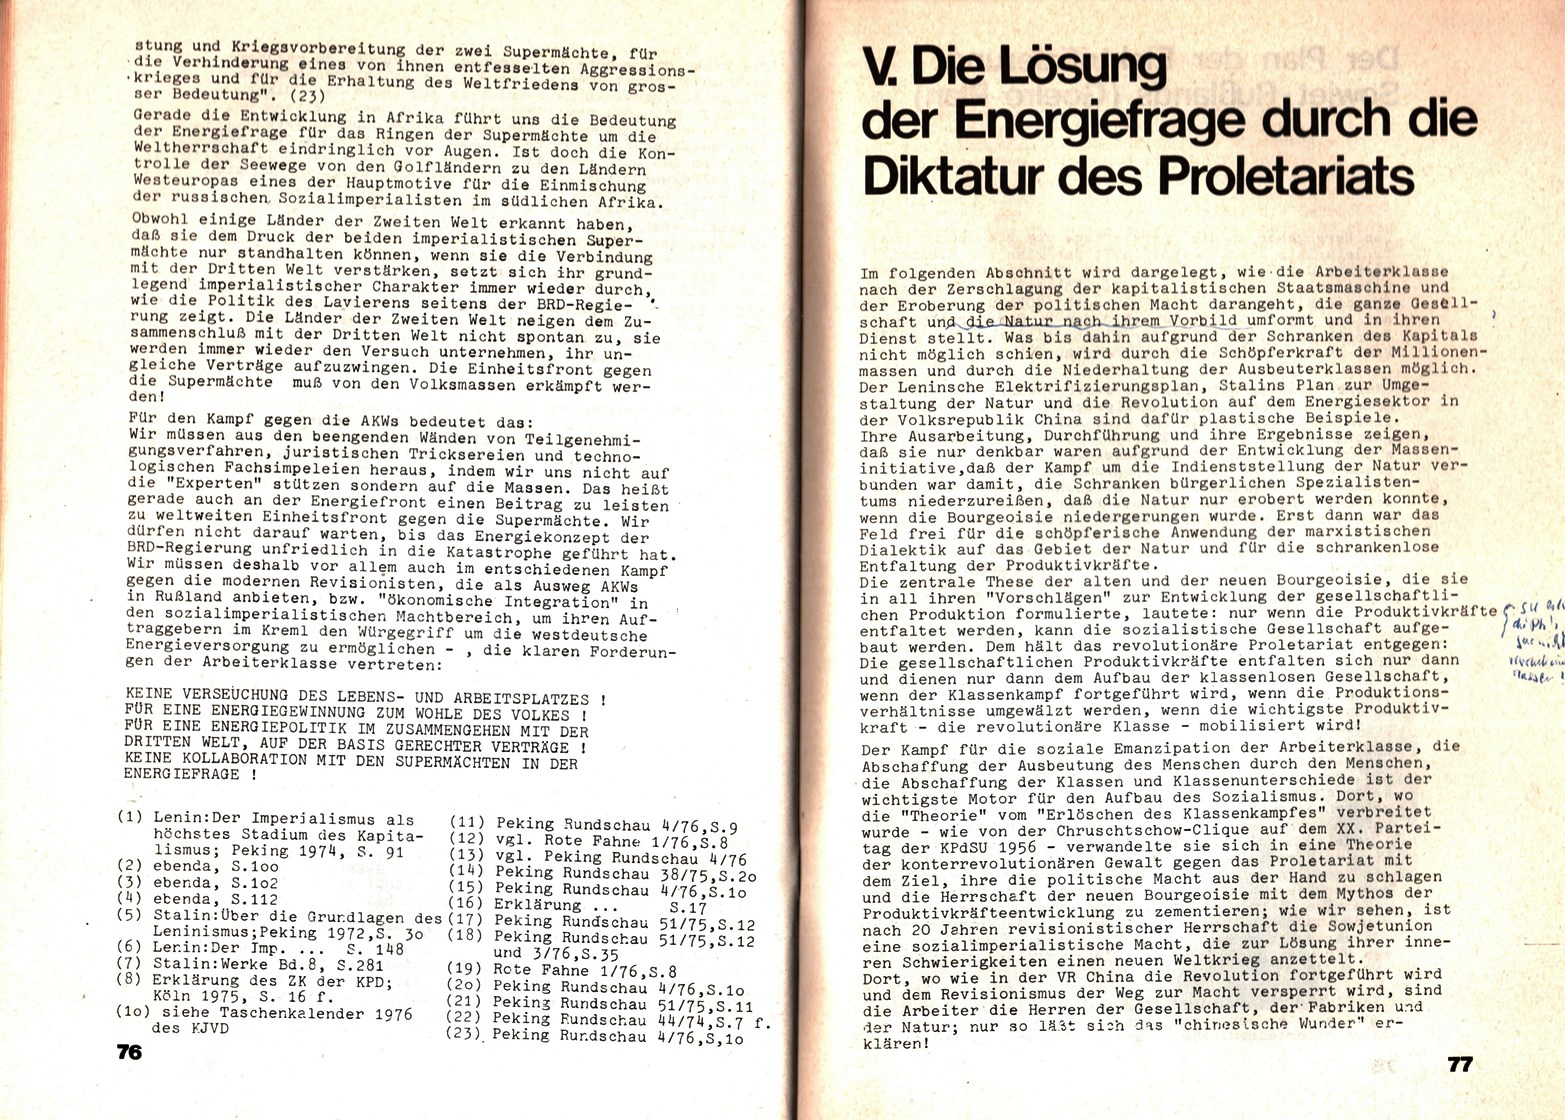 KSV_1976_Atomenergie_im_Kapitalismus_040